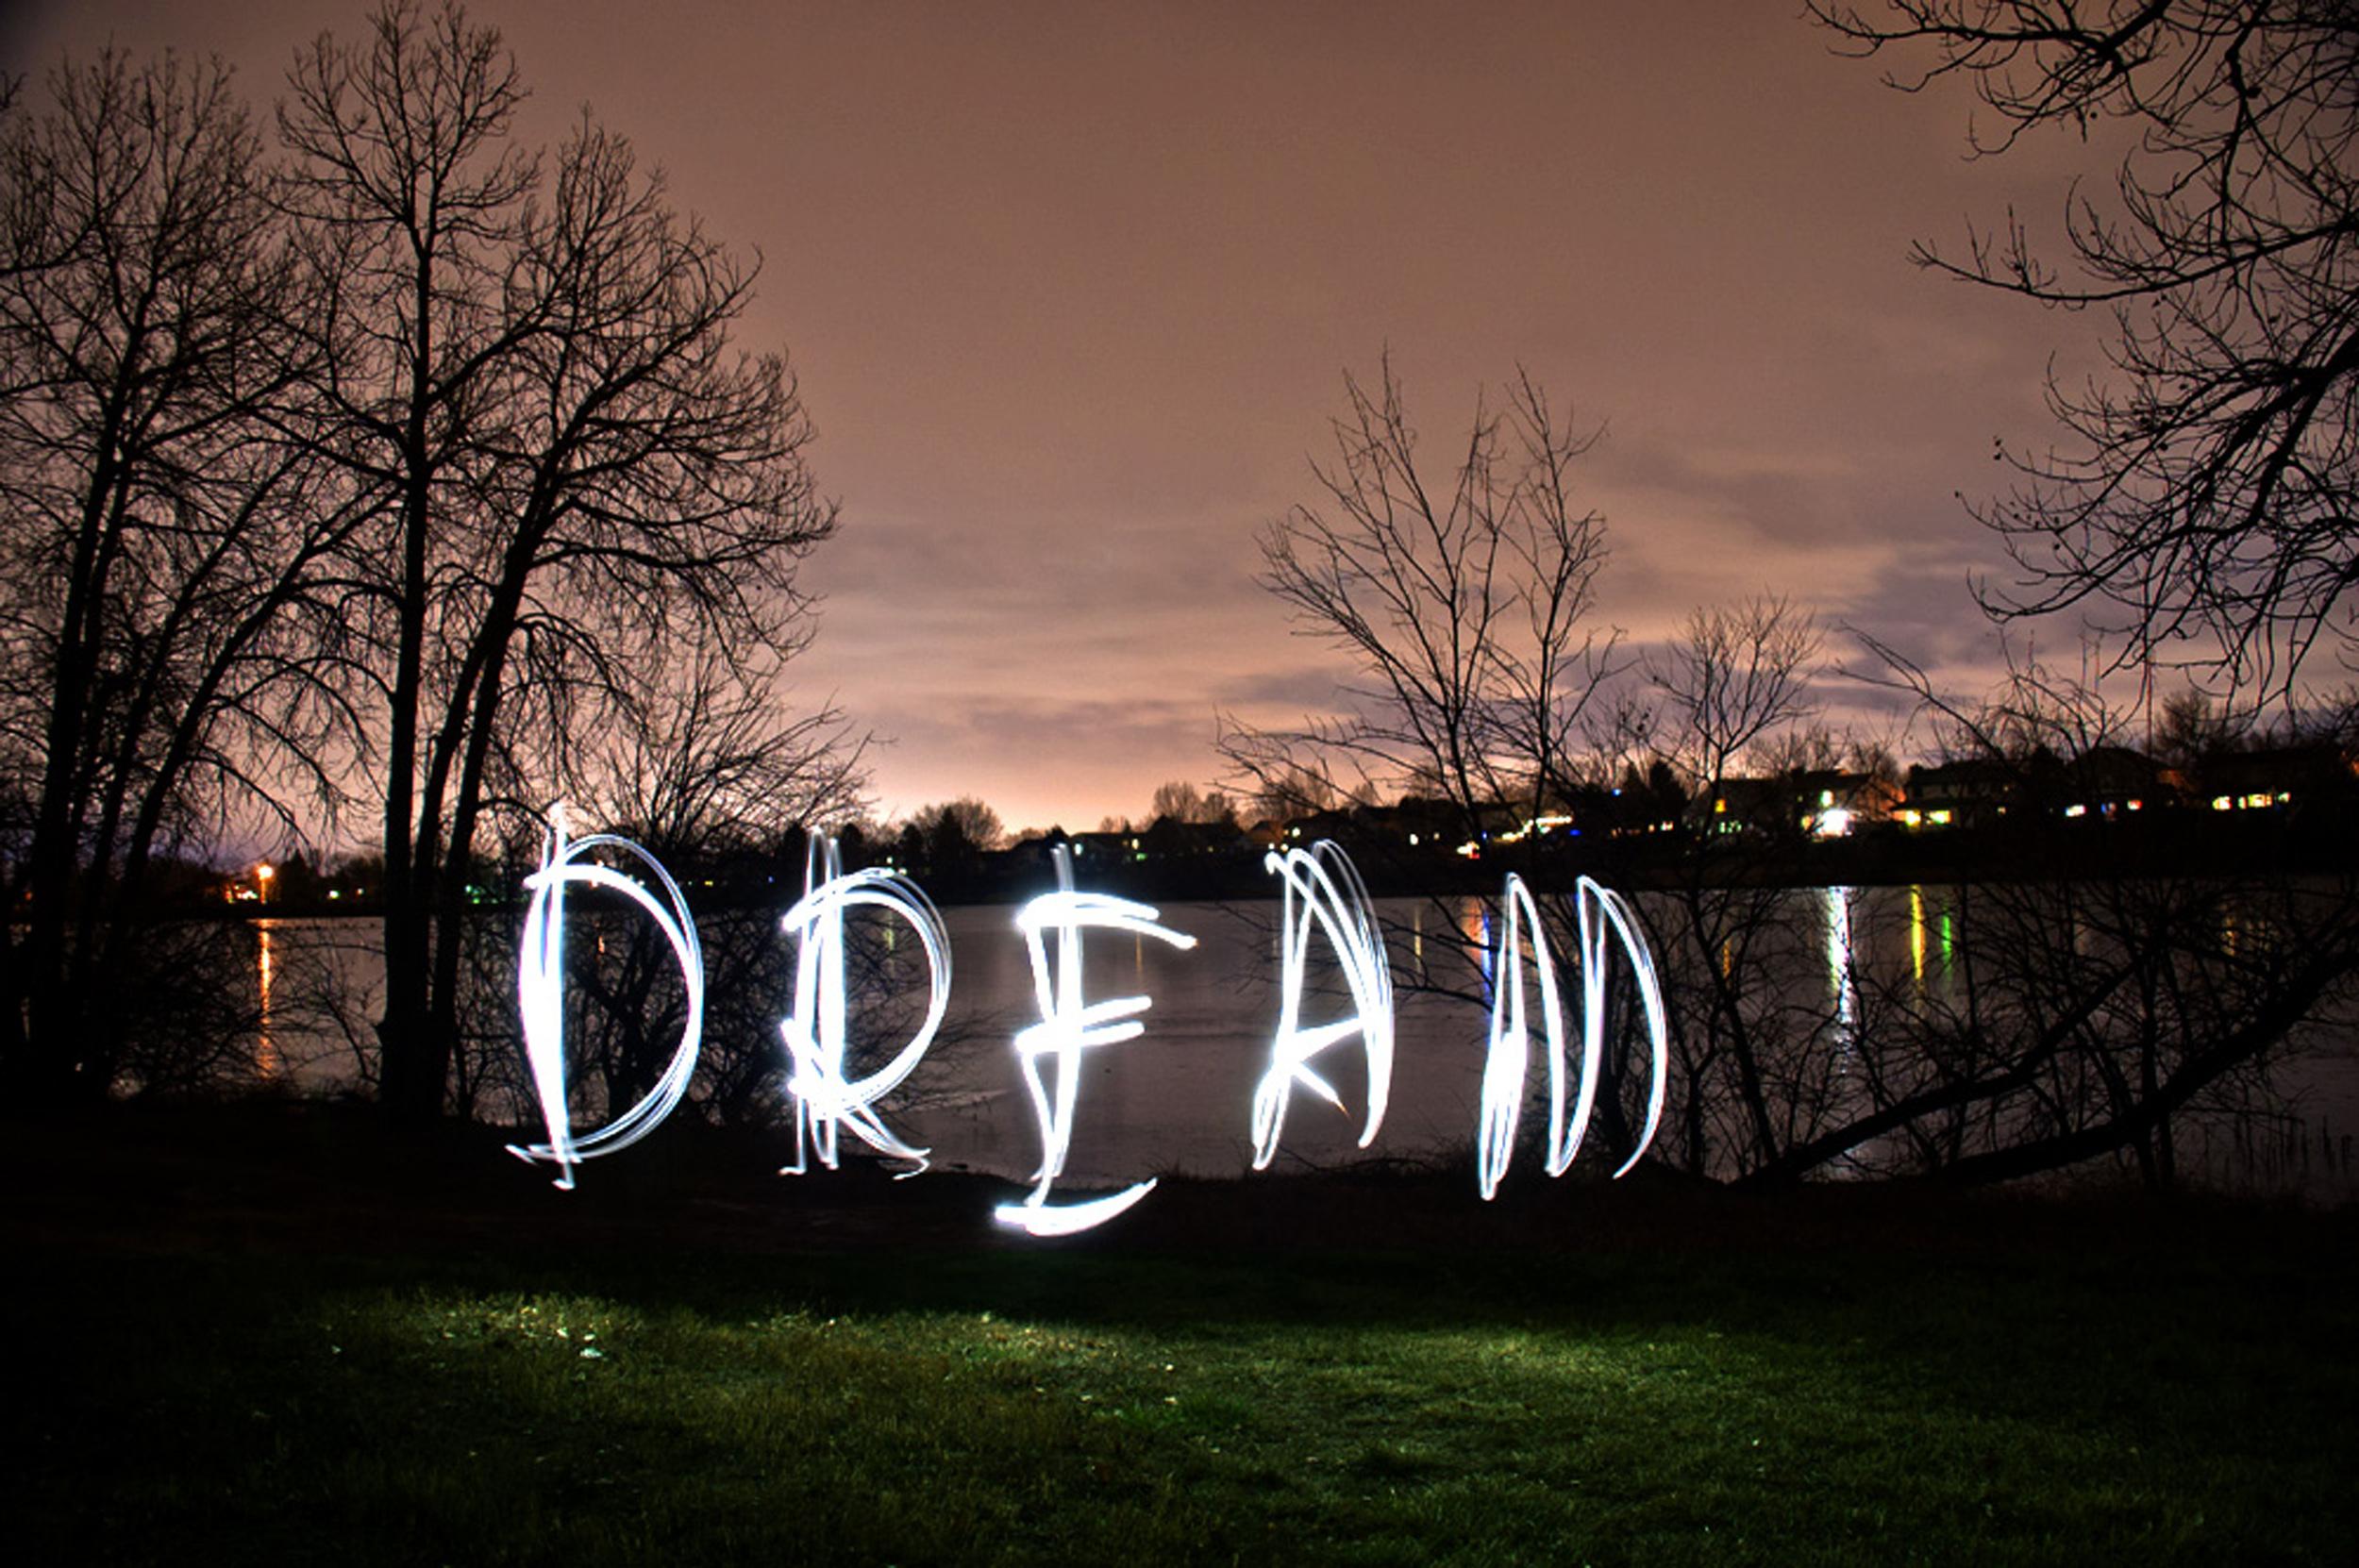 13 Dream.jpg